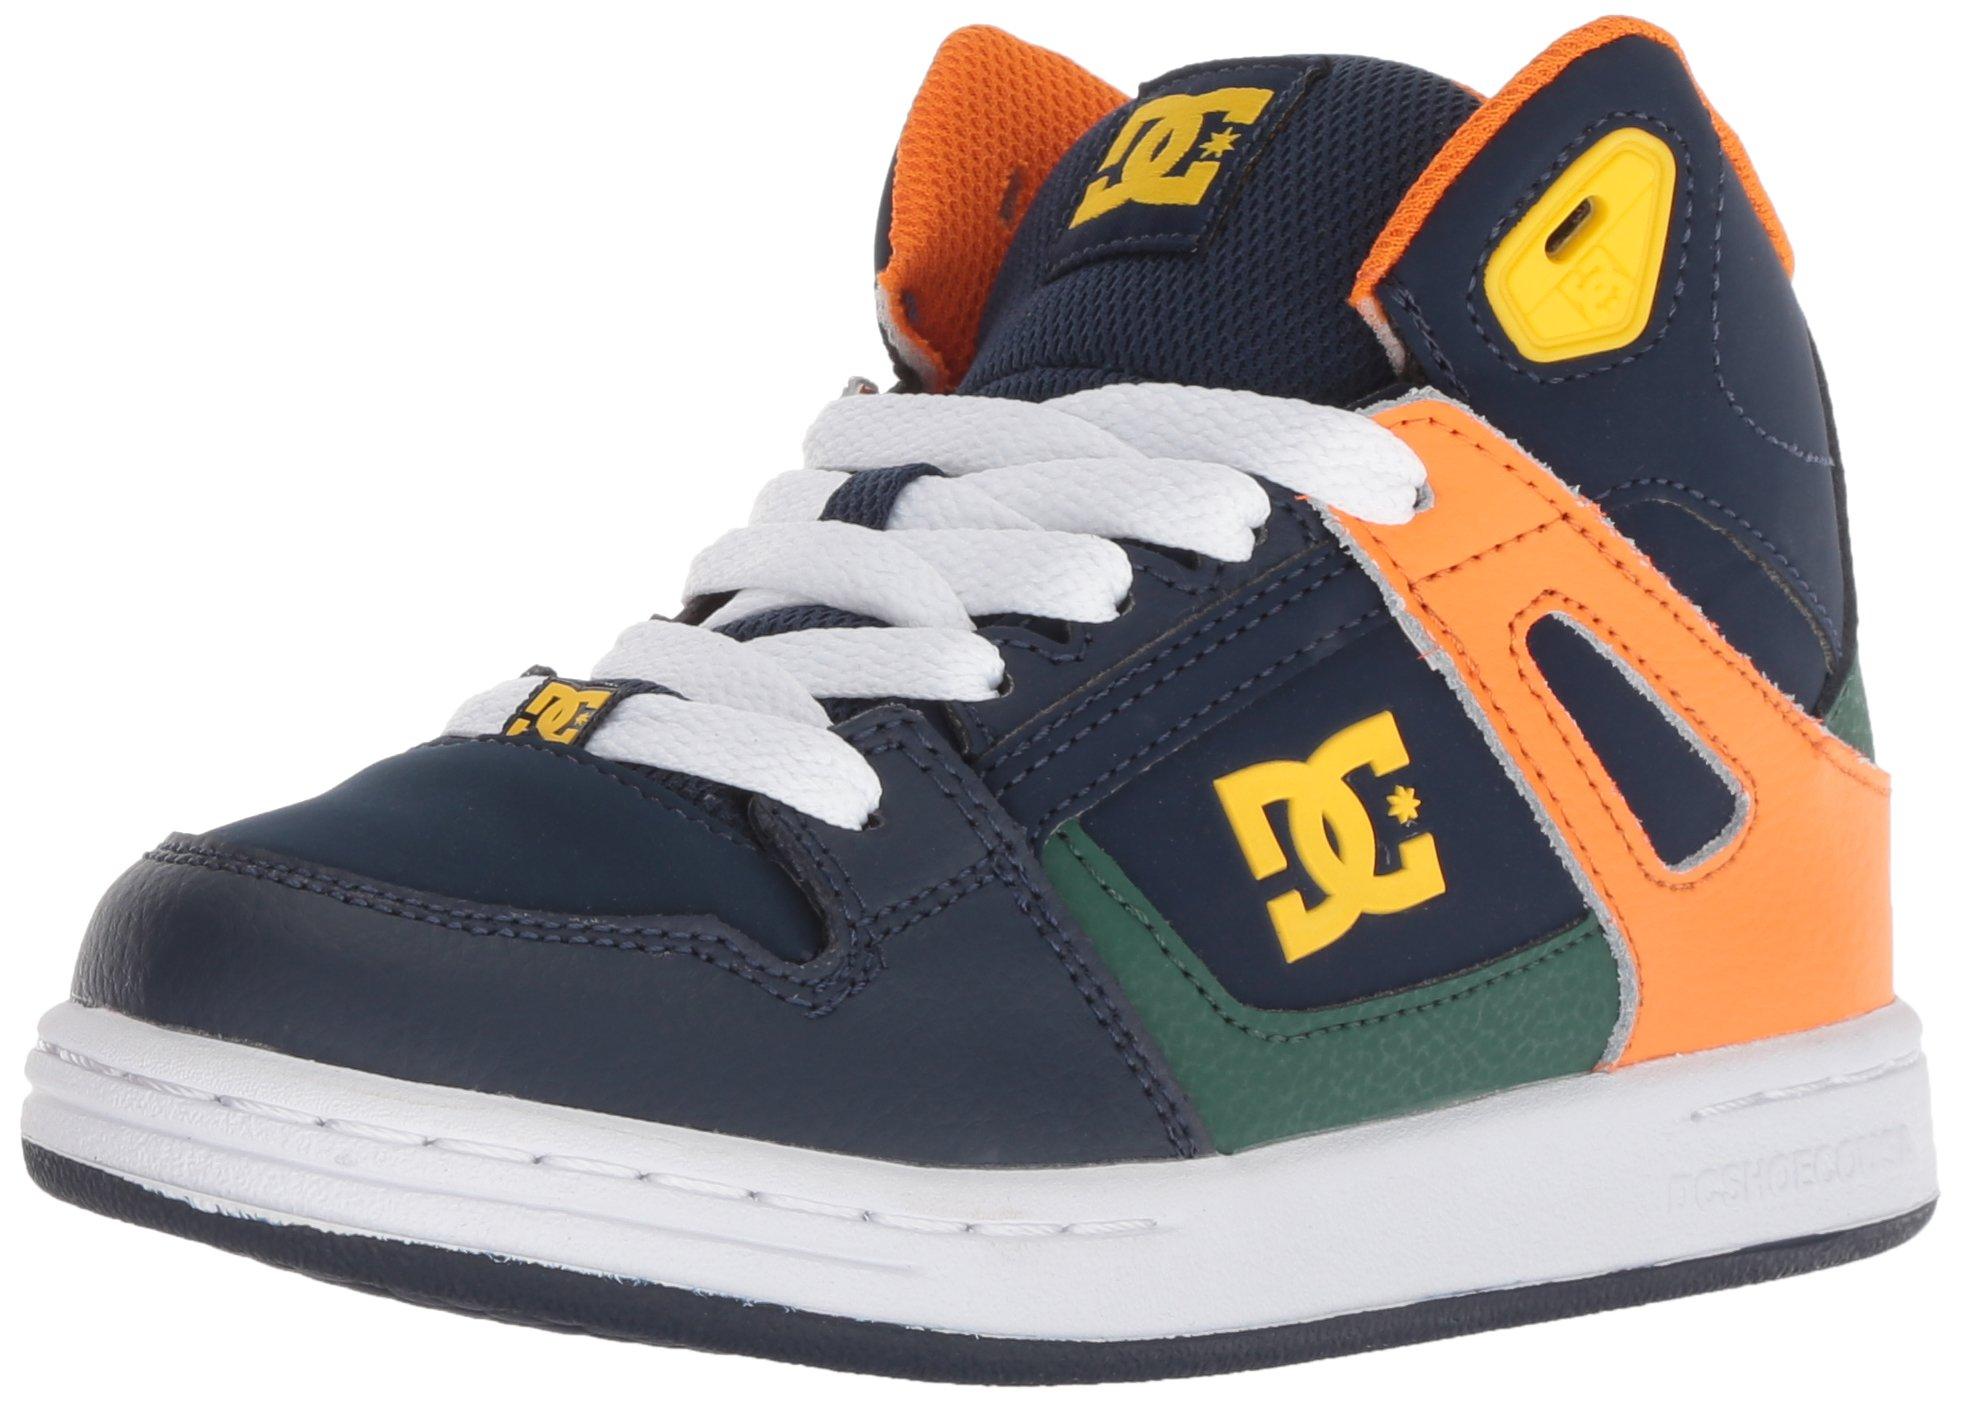 DC Boys' Pure HIGH-TOP Skate Shoe, Multi, 3 M US Little Kid